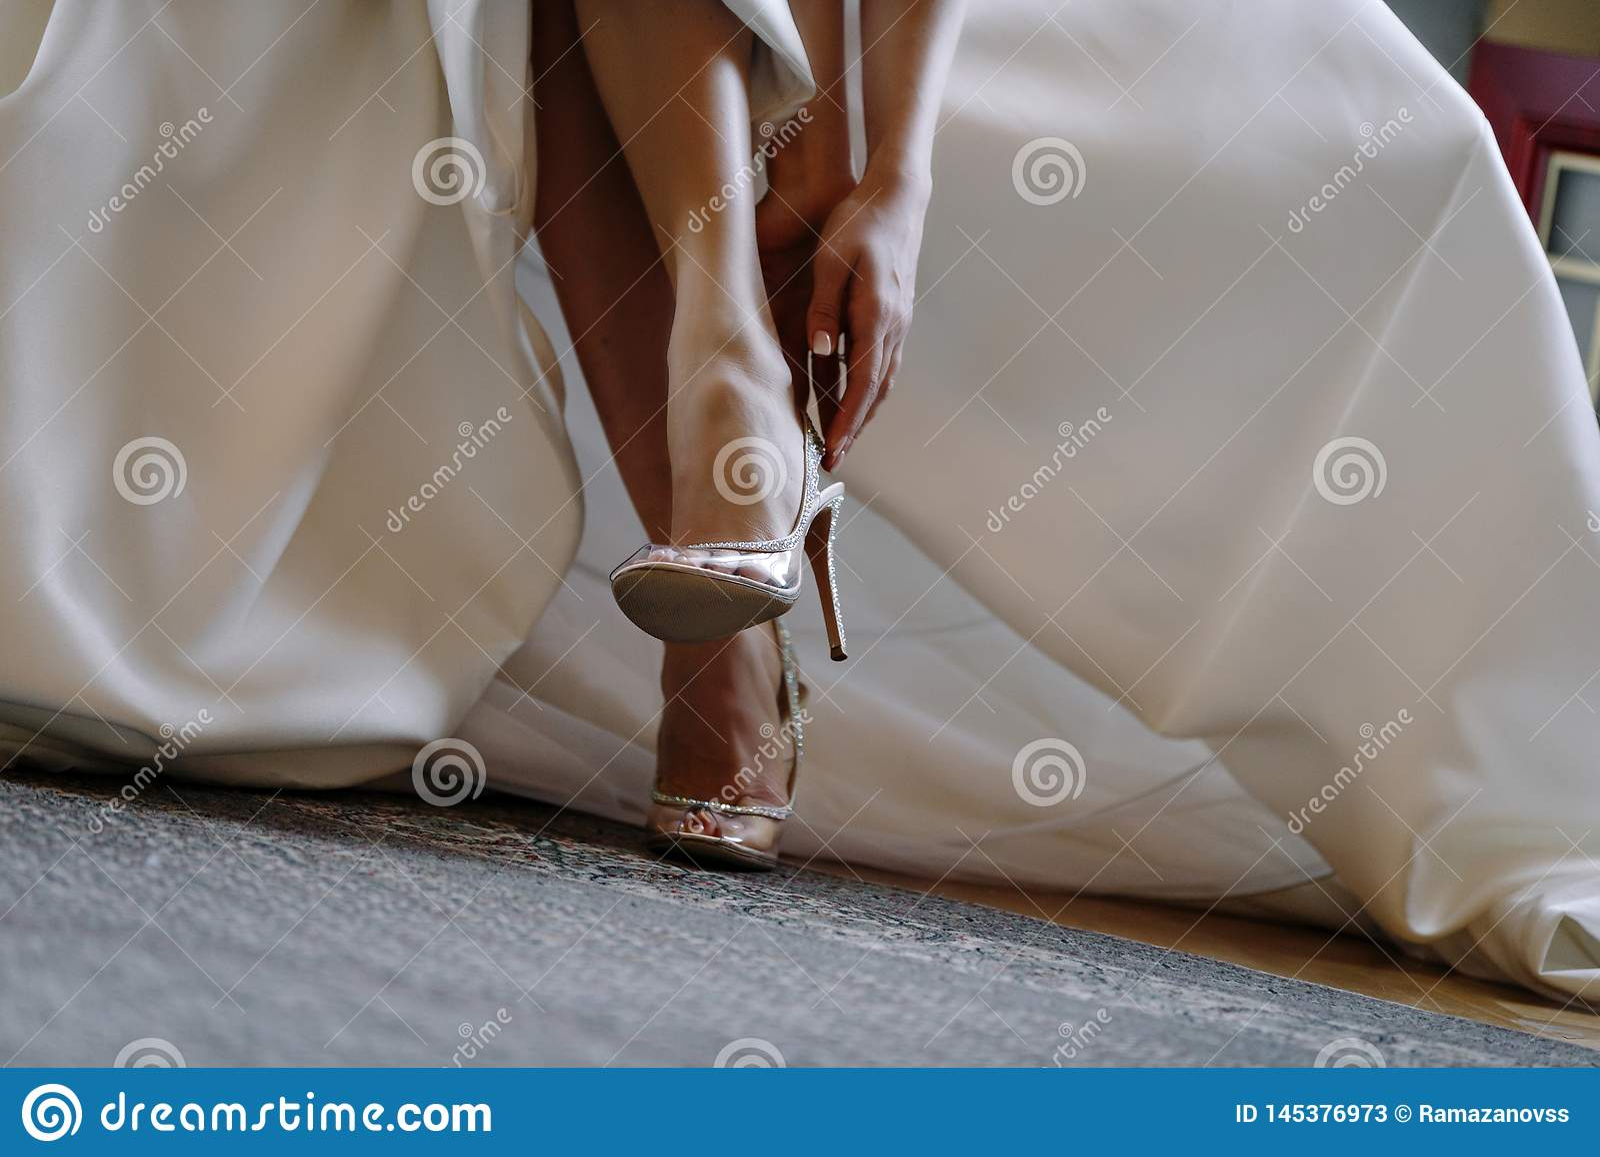 Nogi panna młoda w eleganckich butach